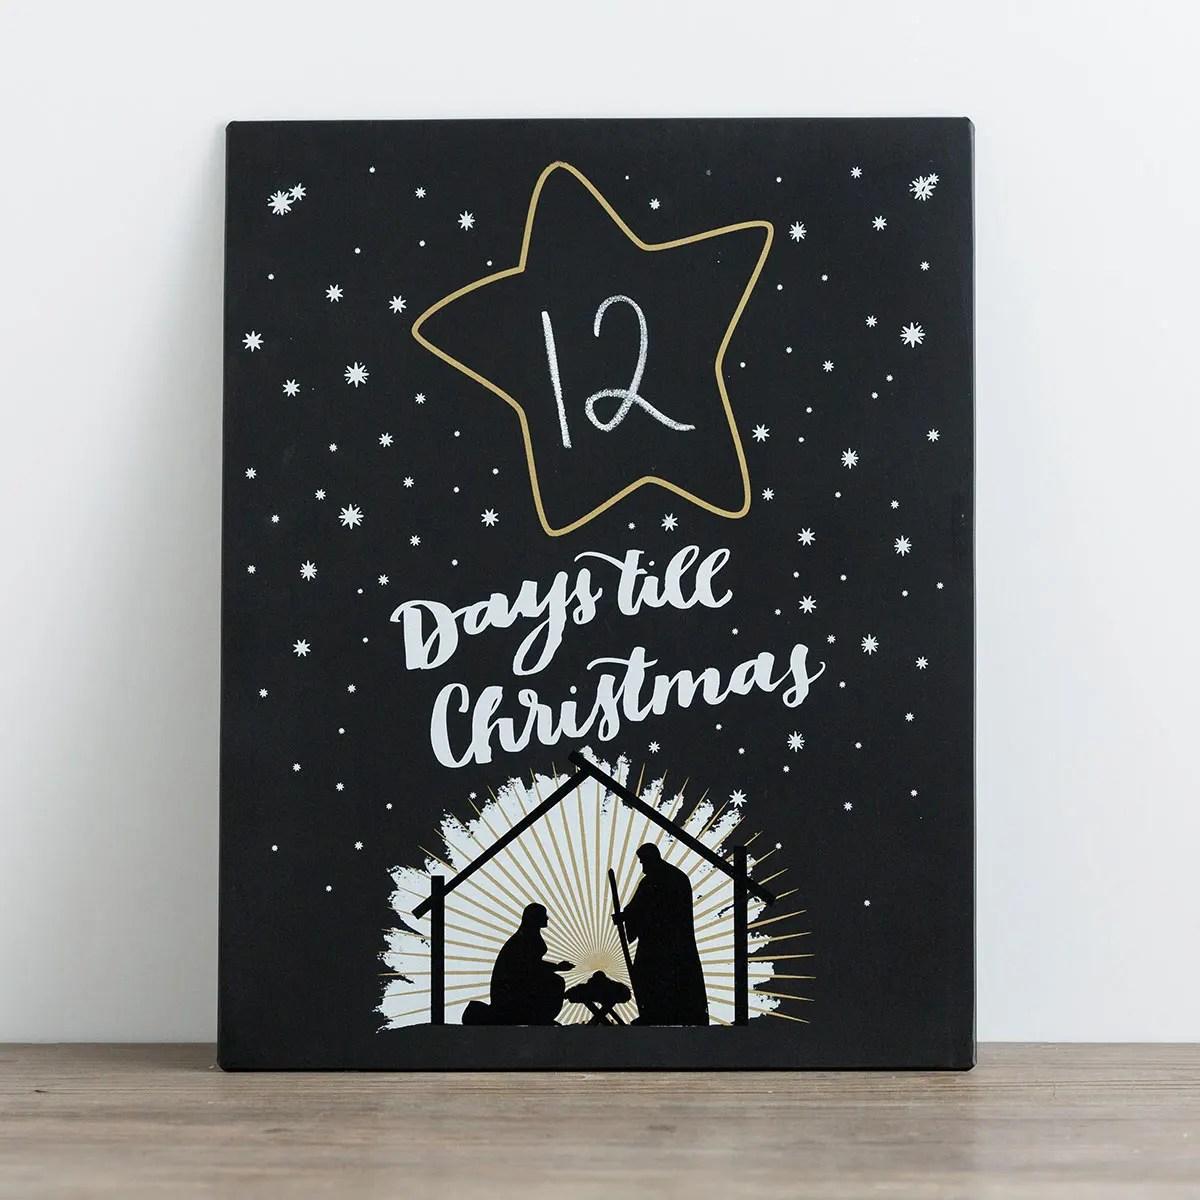 Days till Christmas - Nativity Countdown Plaque